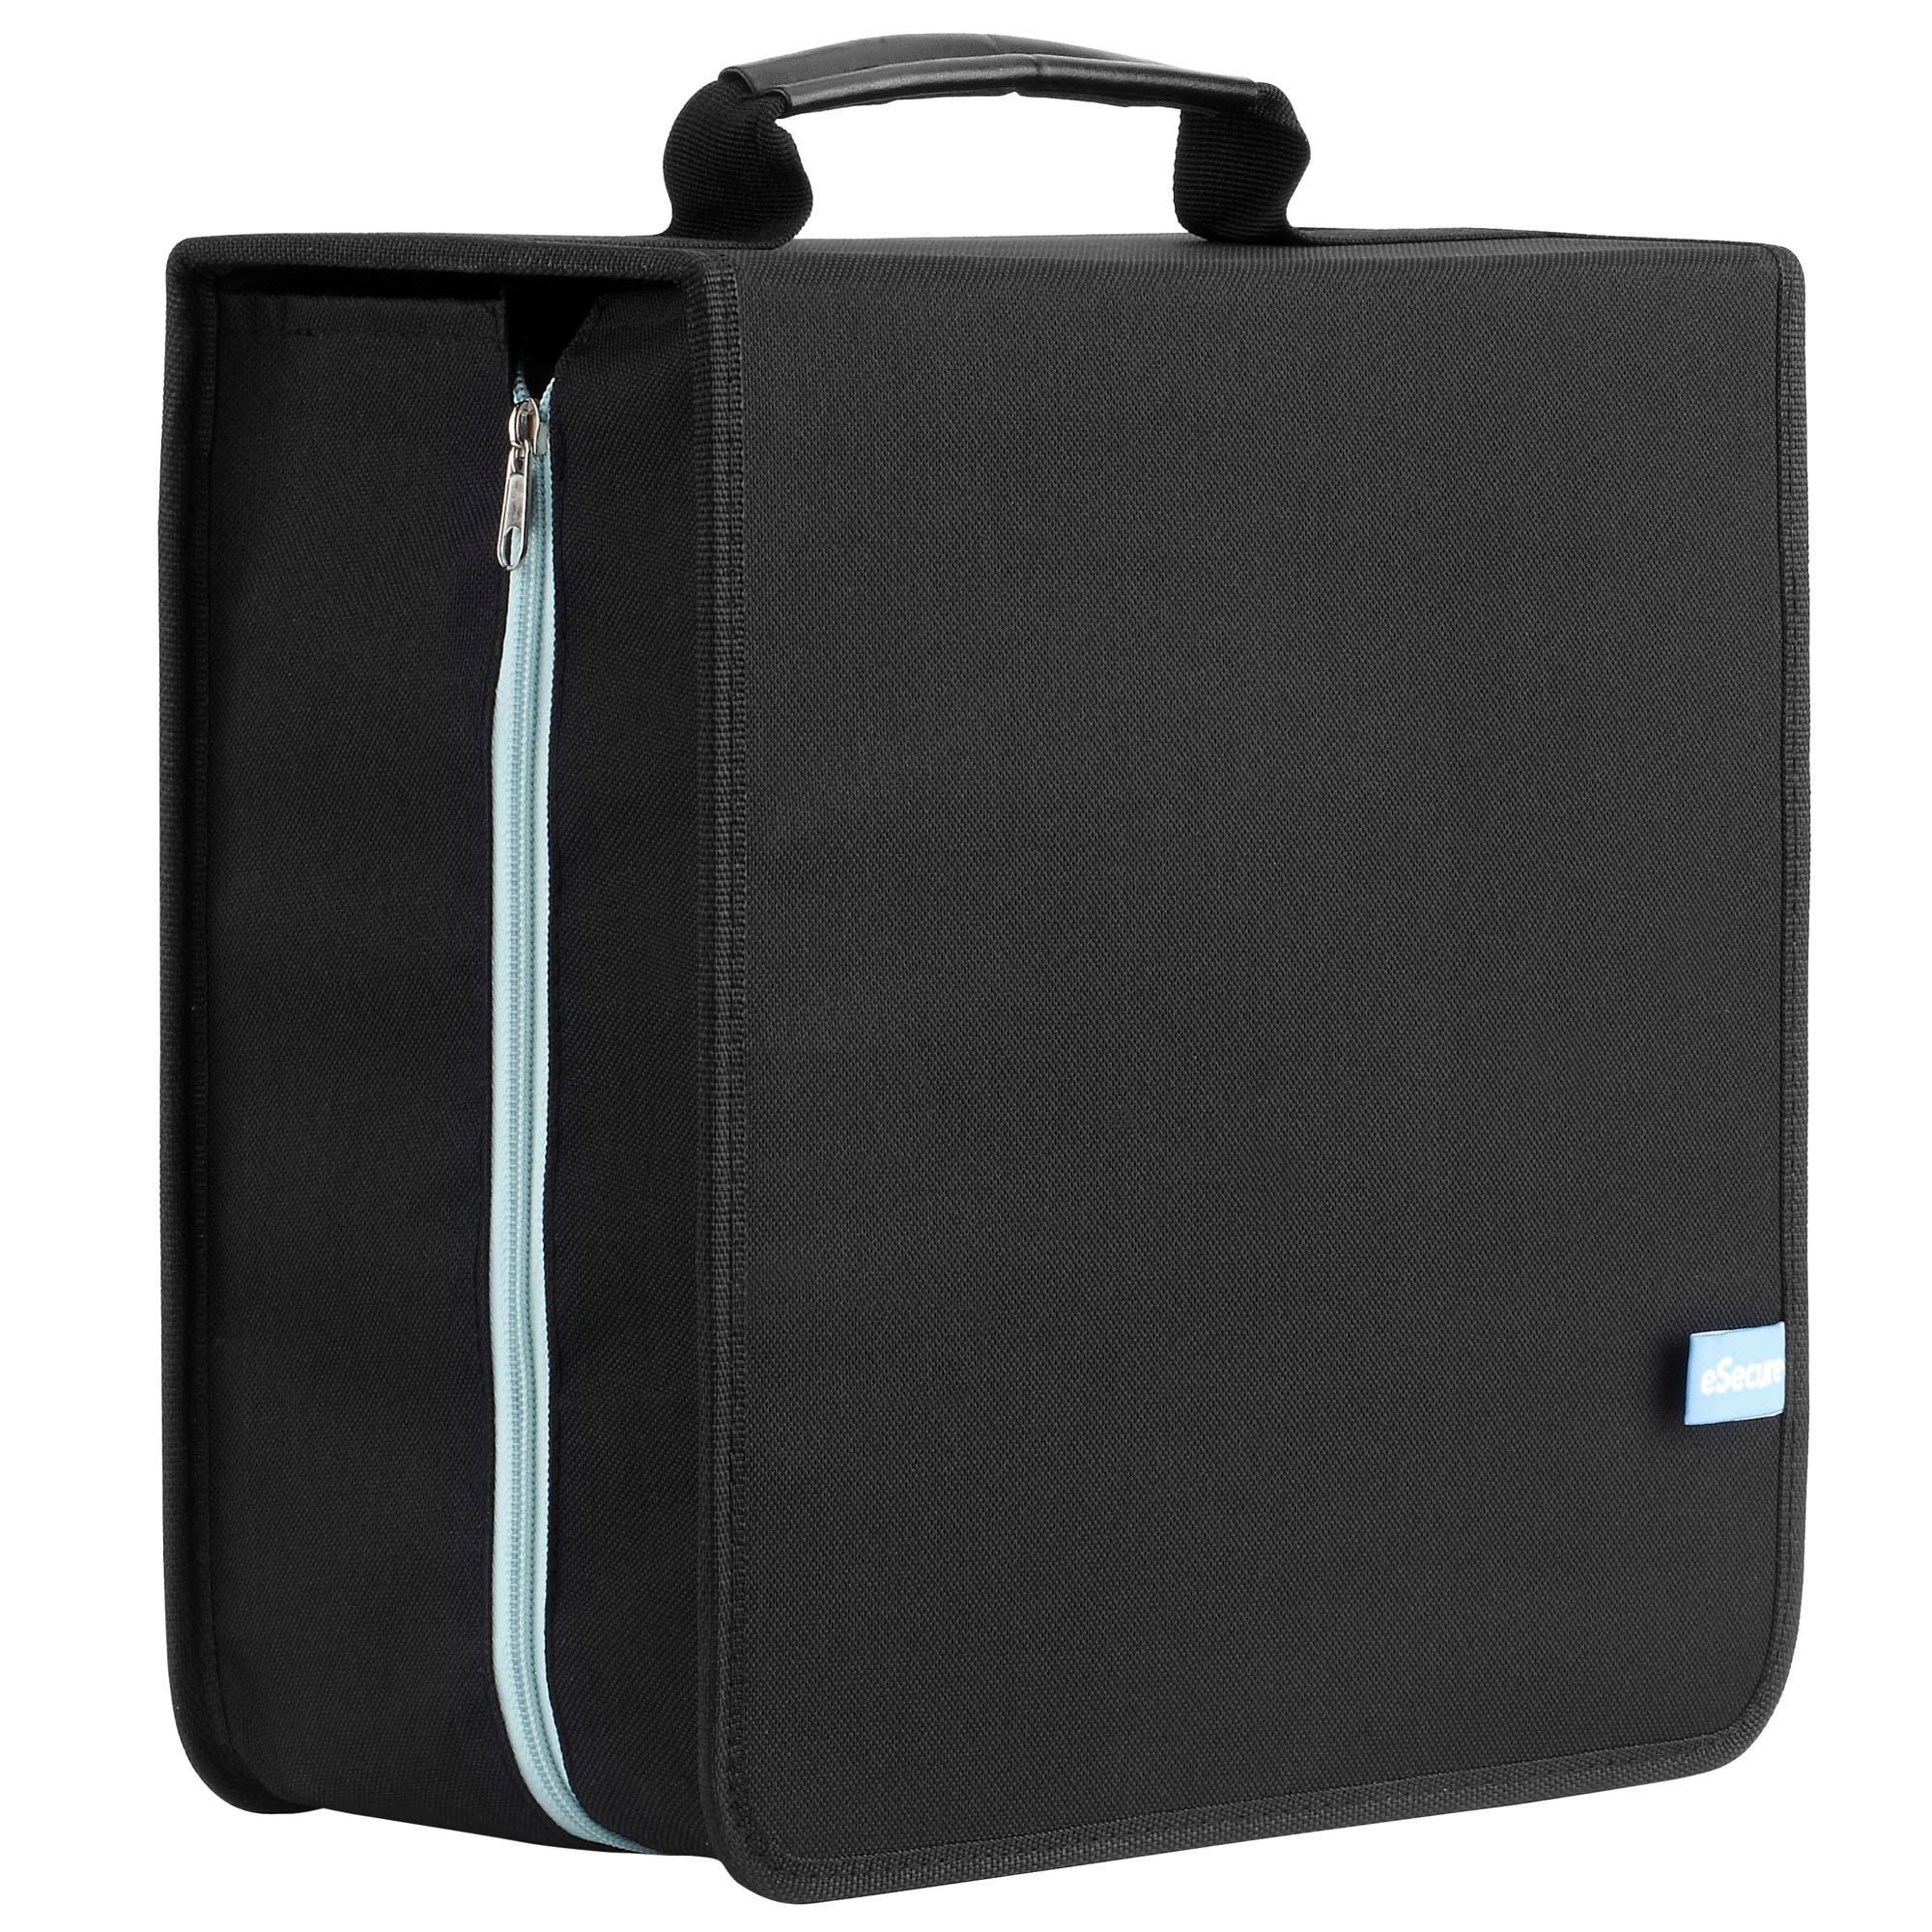 416 sleeve large cd dvd blue ray disc storage holder carry case wallet handle - Dvd case holder shelf ...